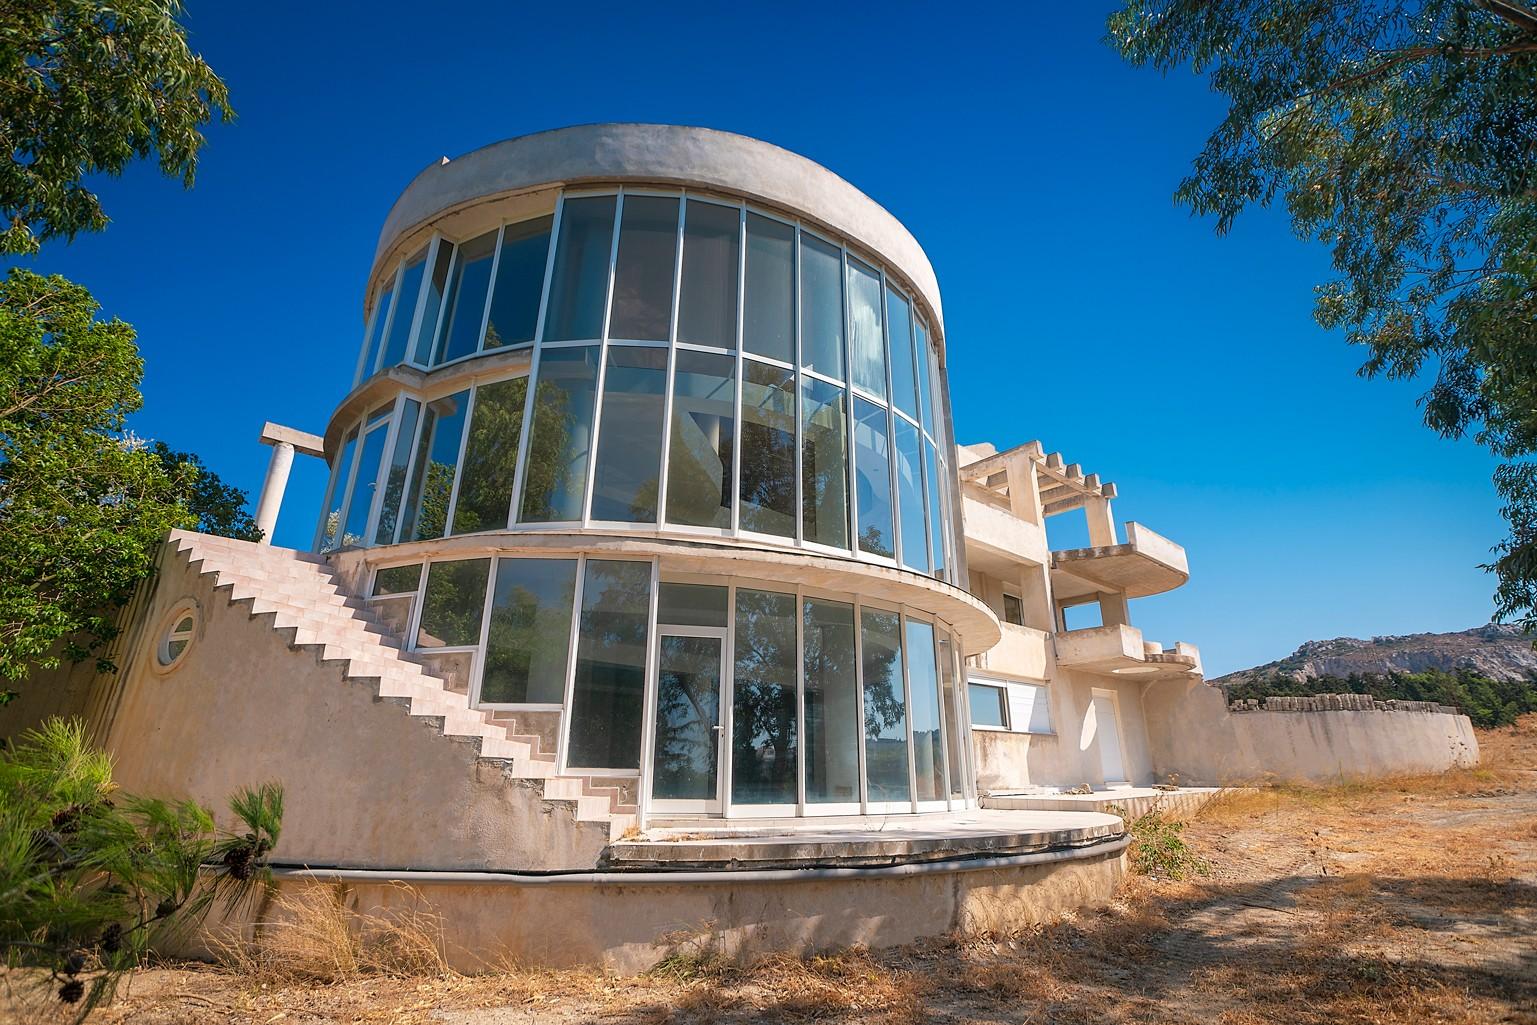 Casa, Rhodes - Ref GR-5688